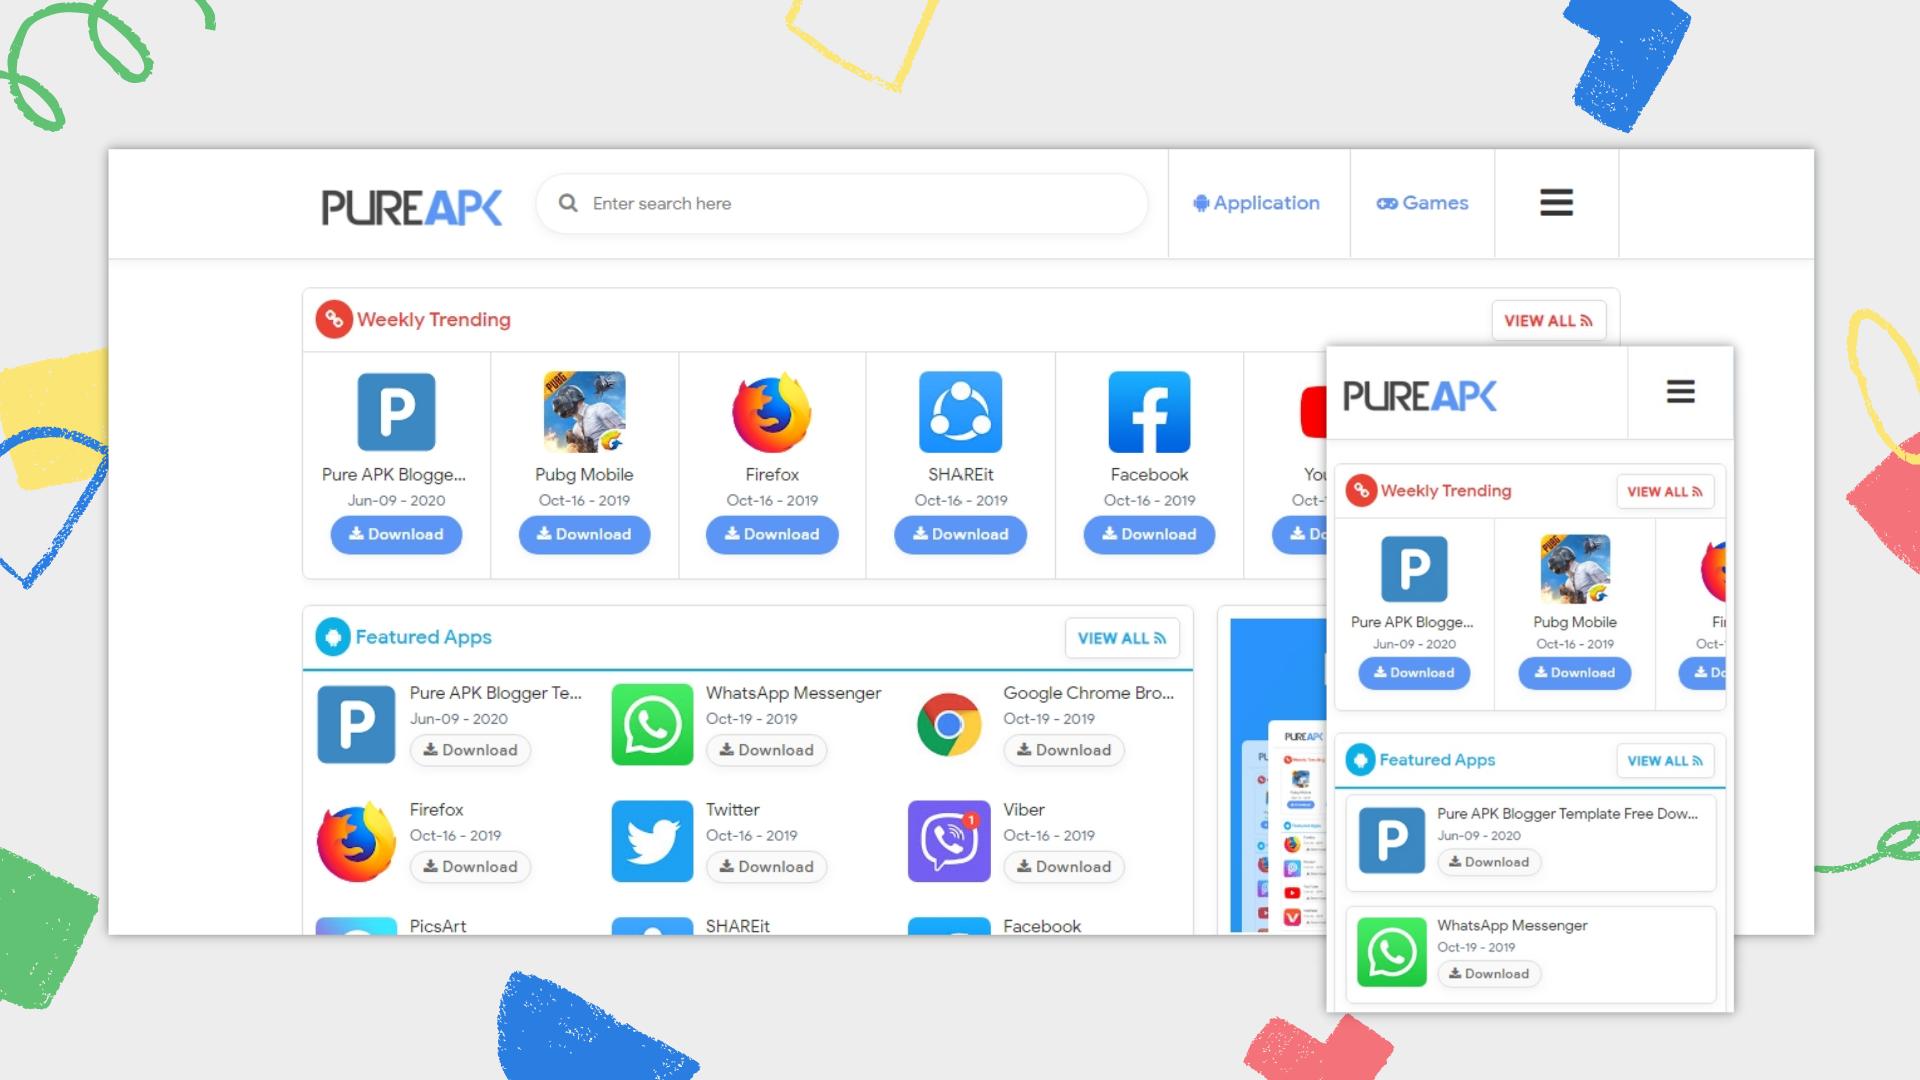 pure-apk-blogger-template